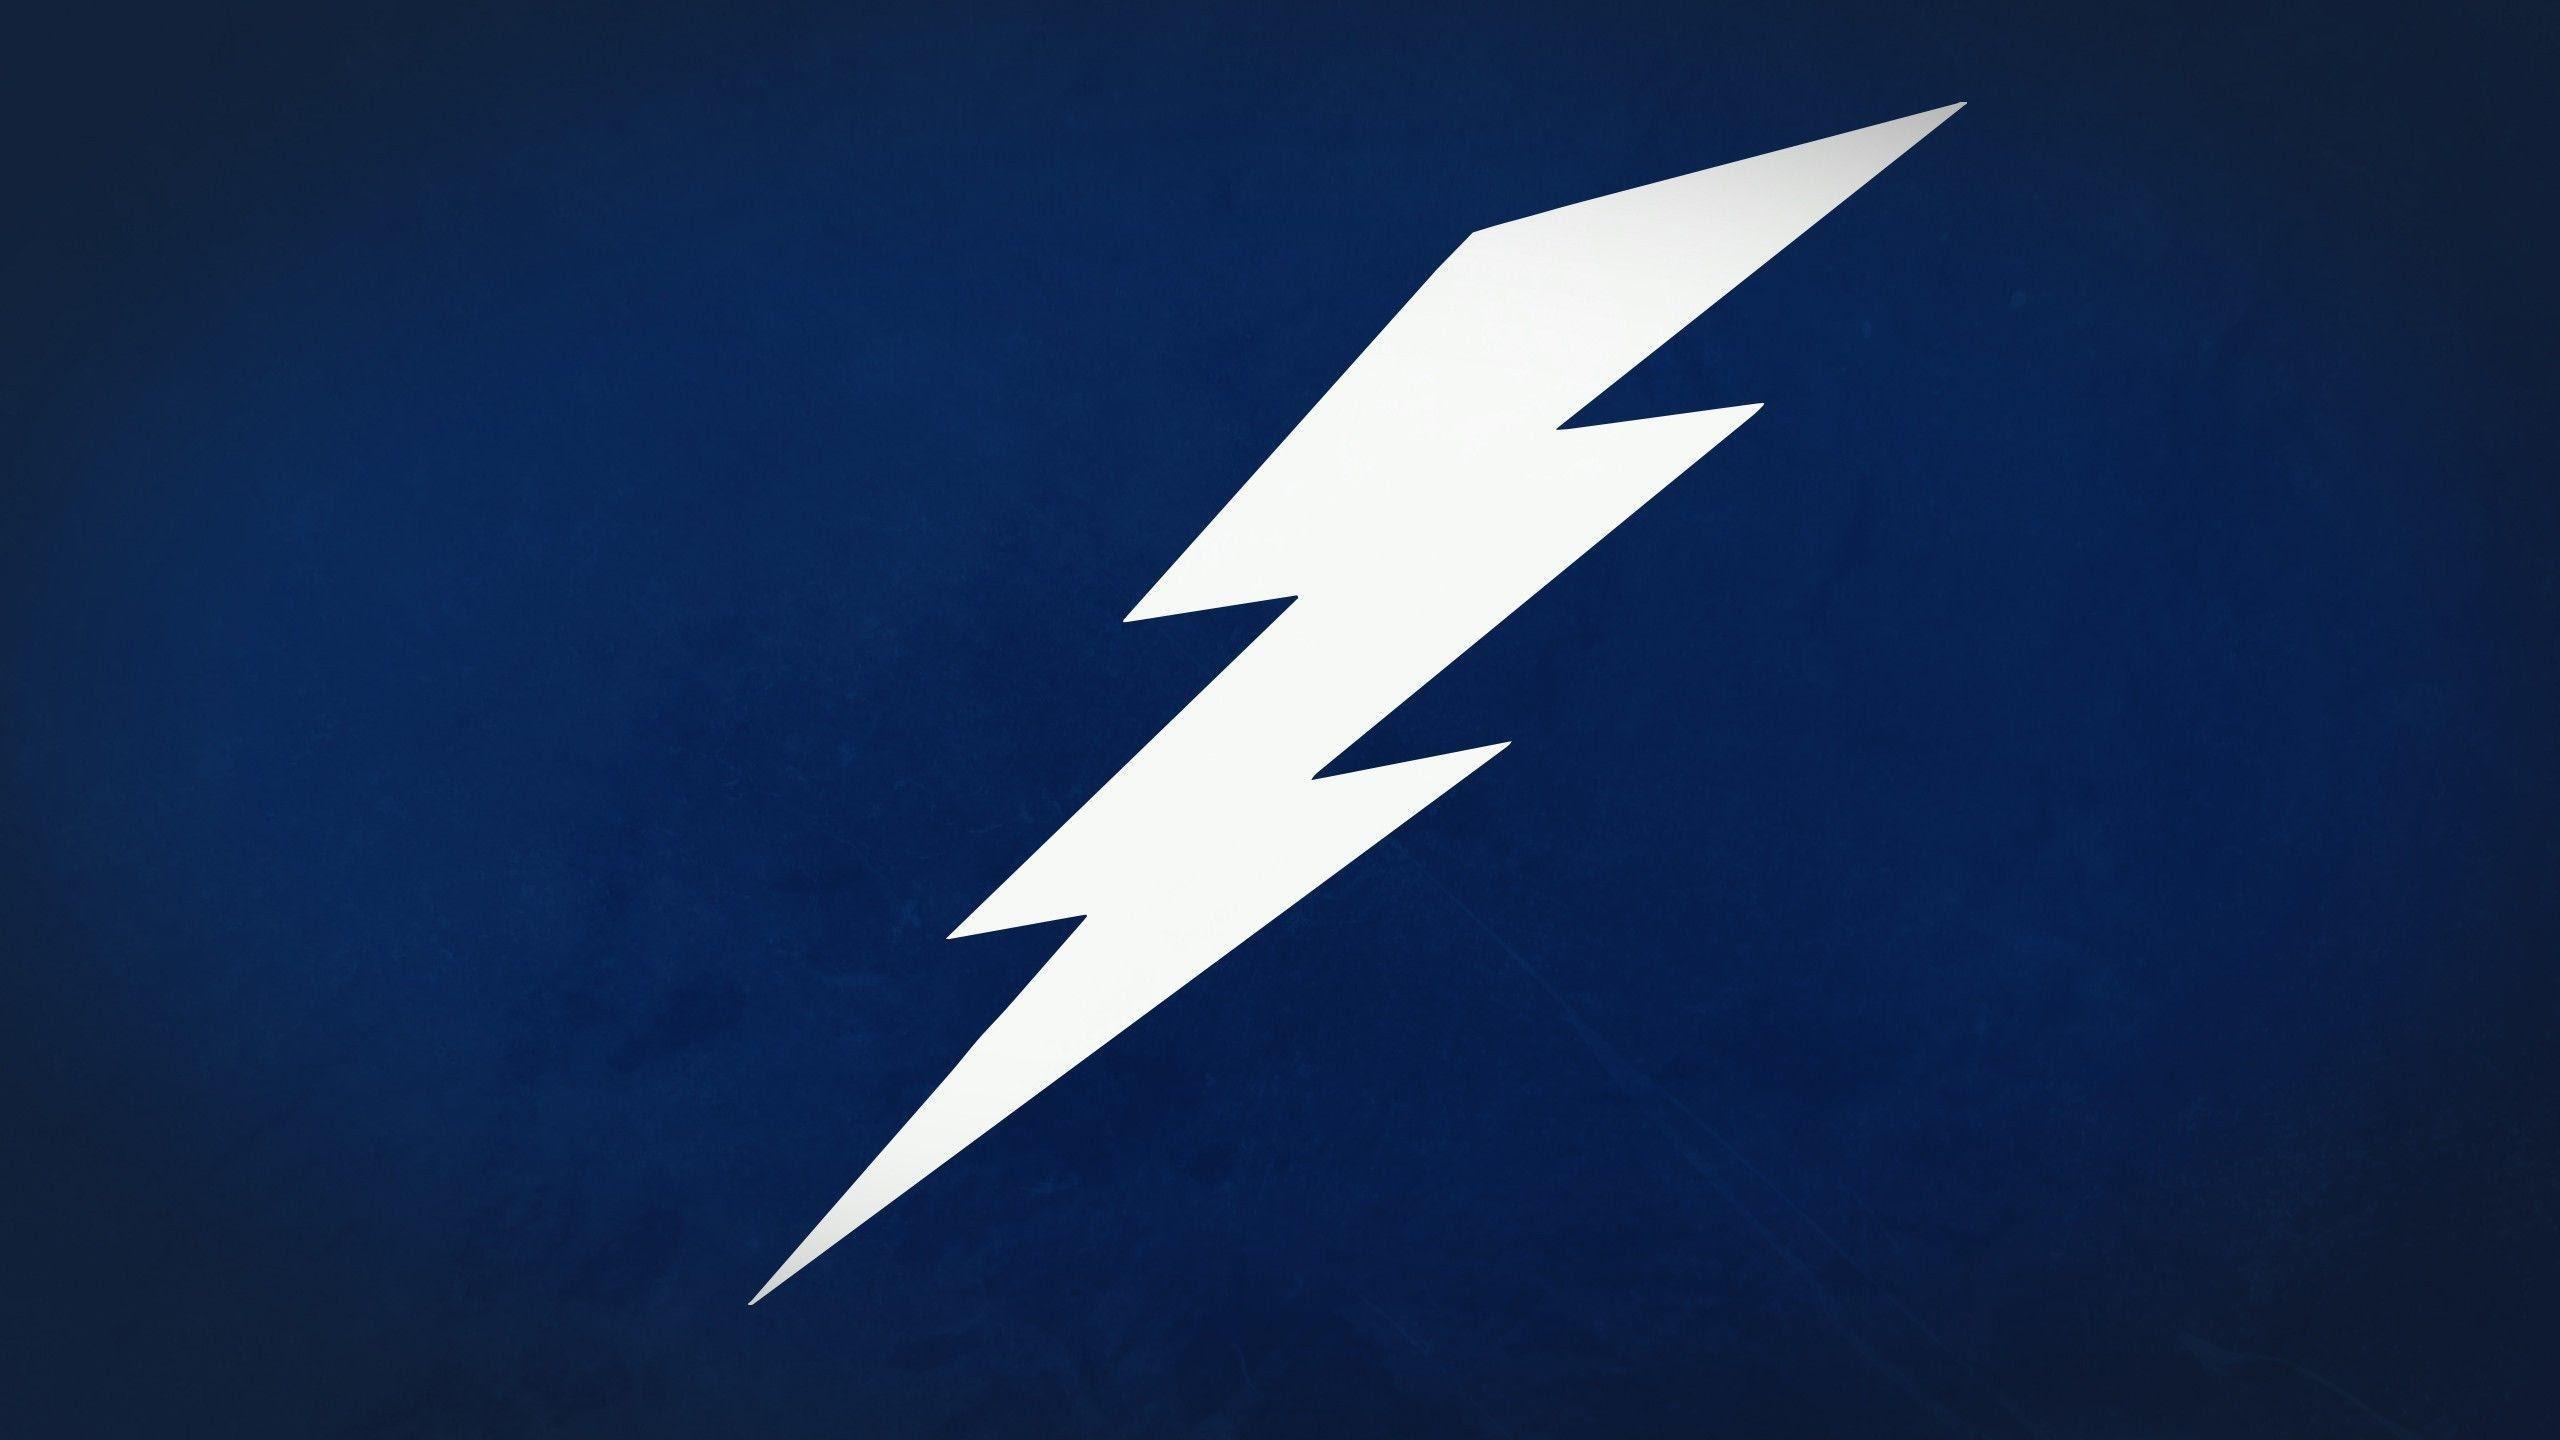 Tampa Bay Lightning Wallpaper 65 Images